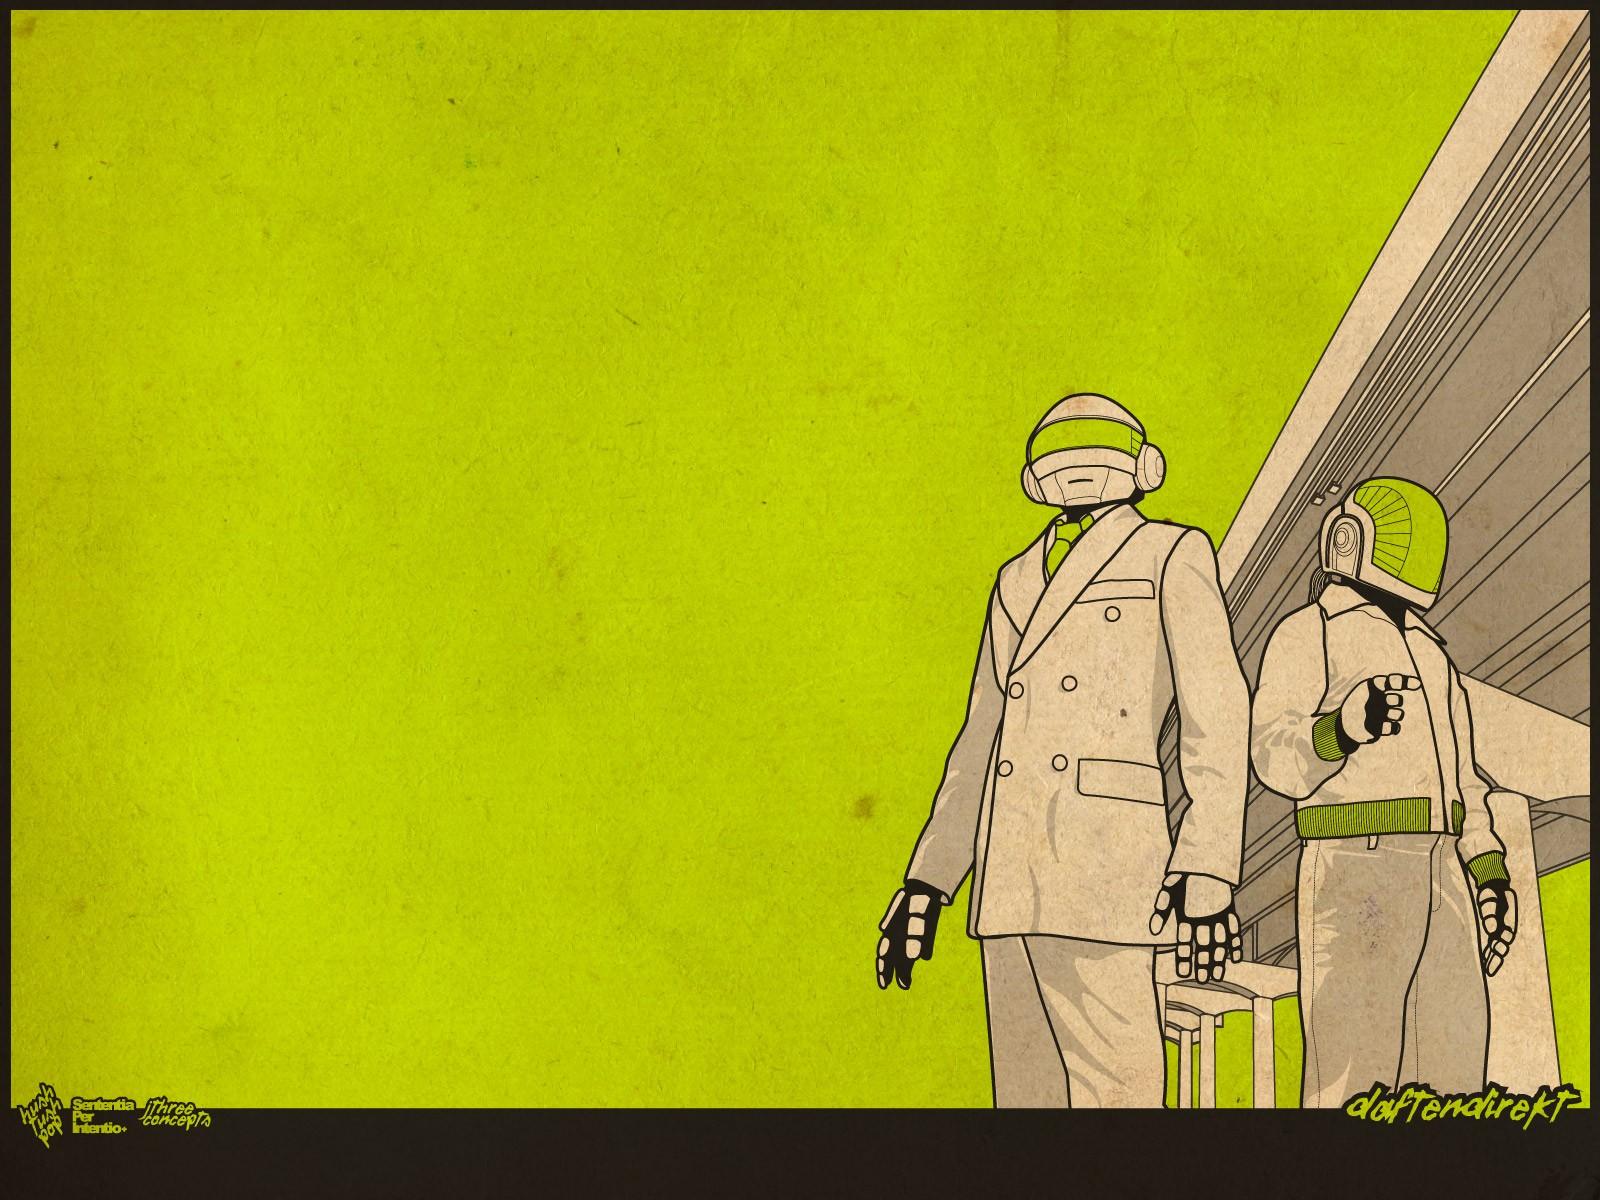 Wallpaper : drawing, illustration, artwork, music, green, yellow ...